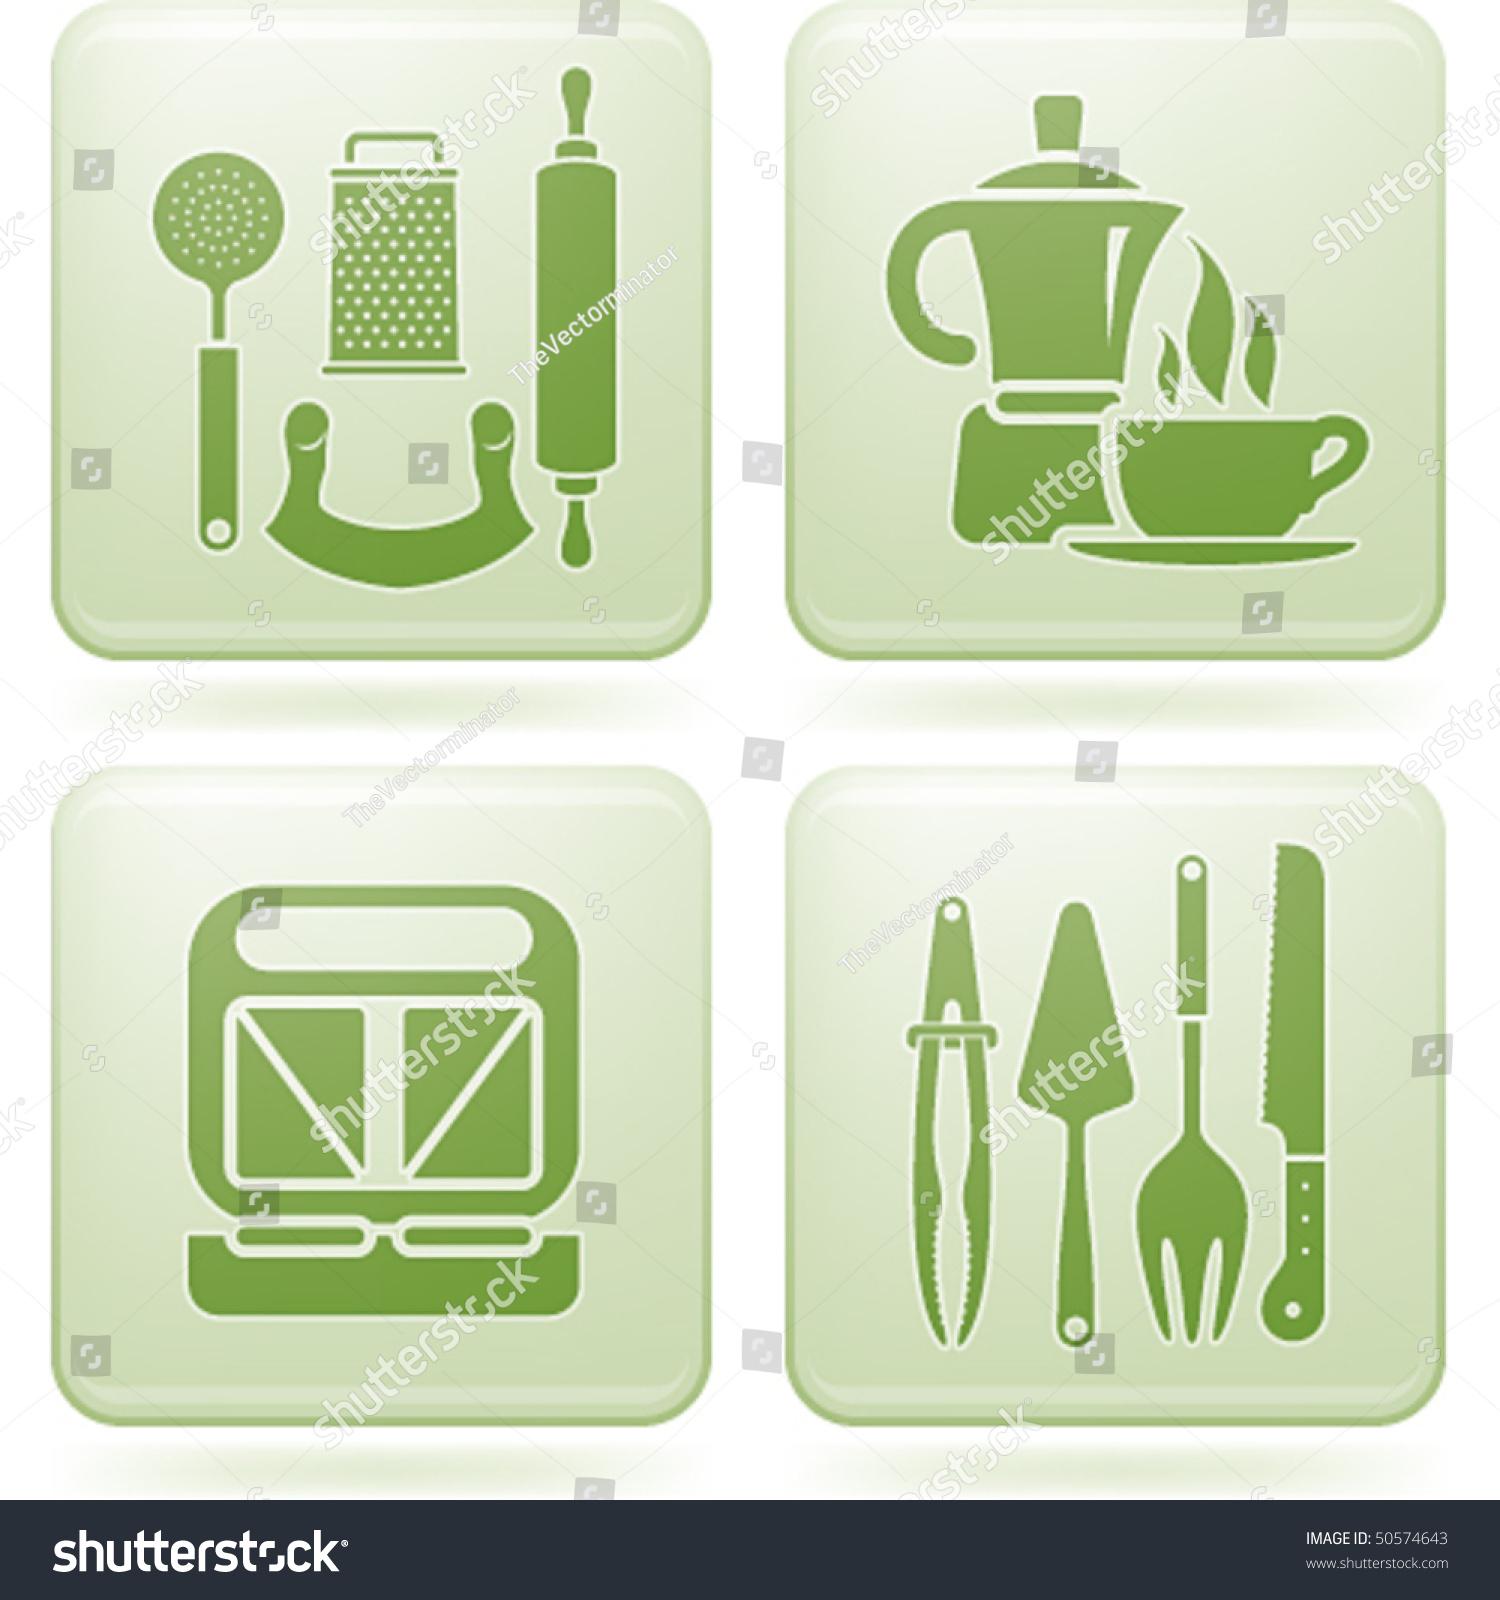 Cobalt square 2d icons set kitchen utensils stock vector for Kitchen set 2d